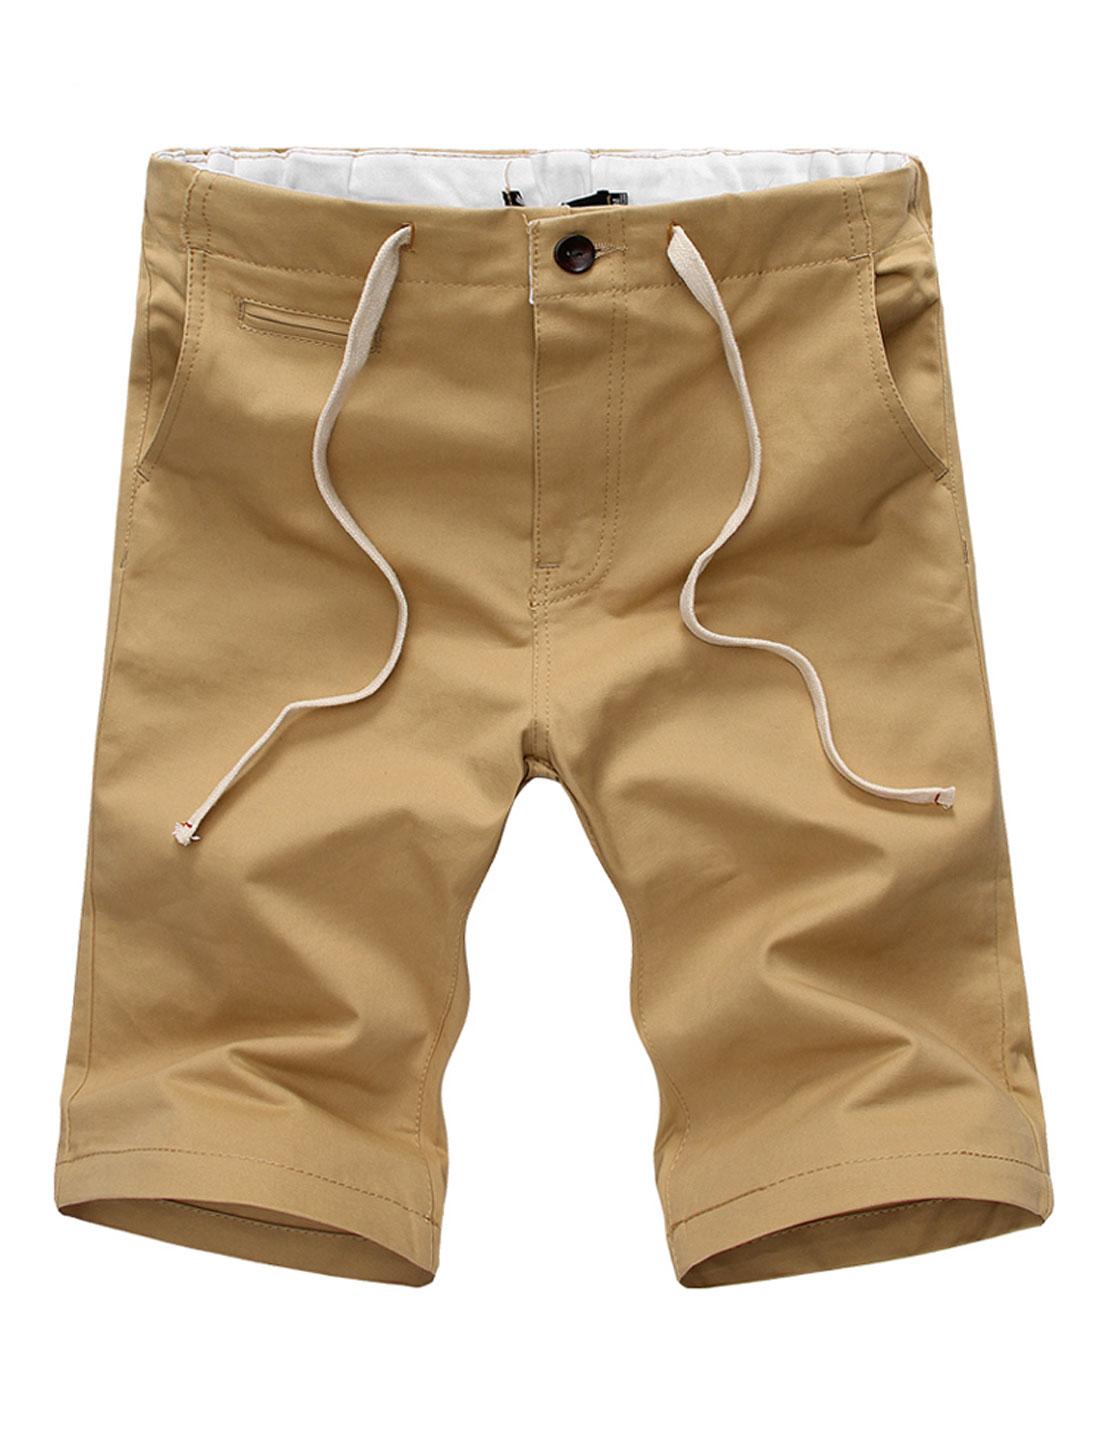 Men Double Hip Pockets Zipper Fly Loose Fit Shorts Khaki W32